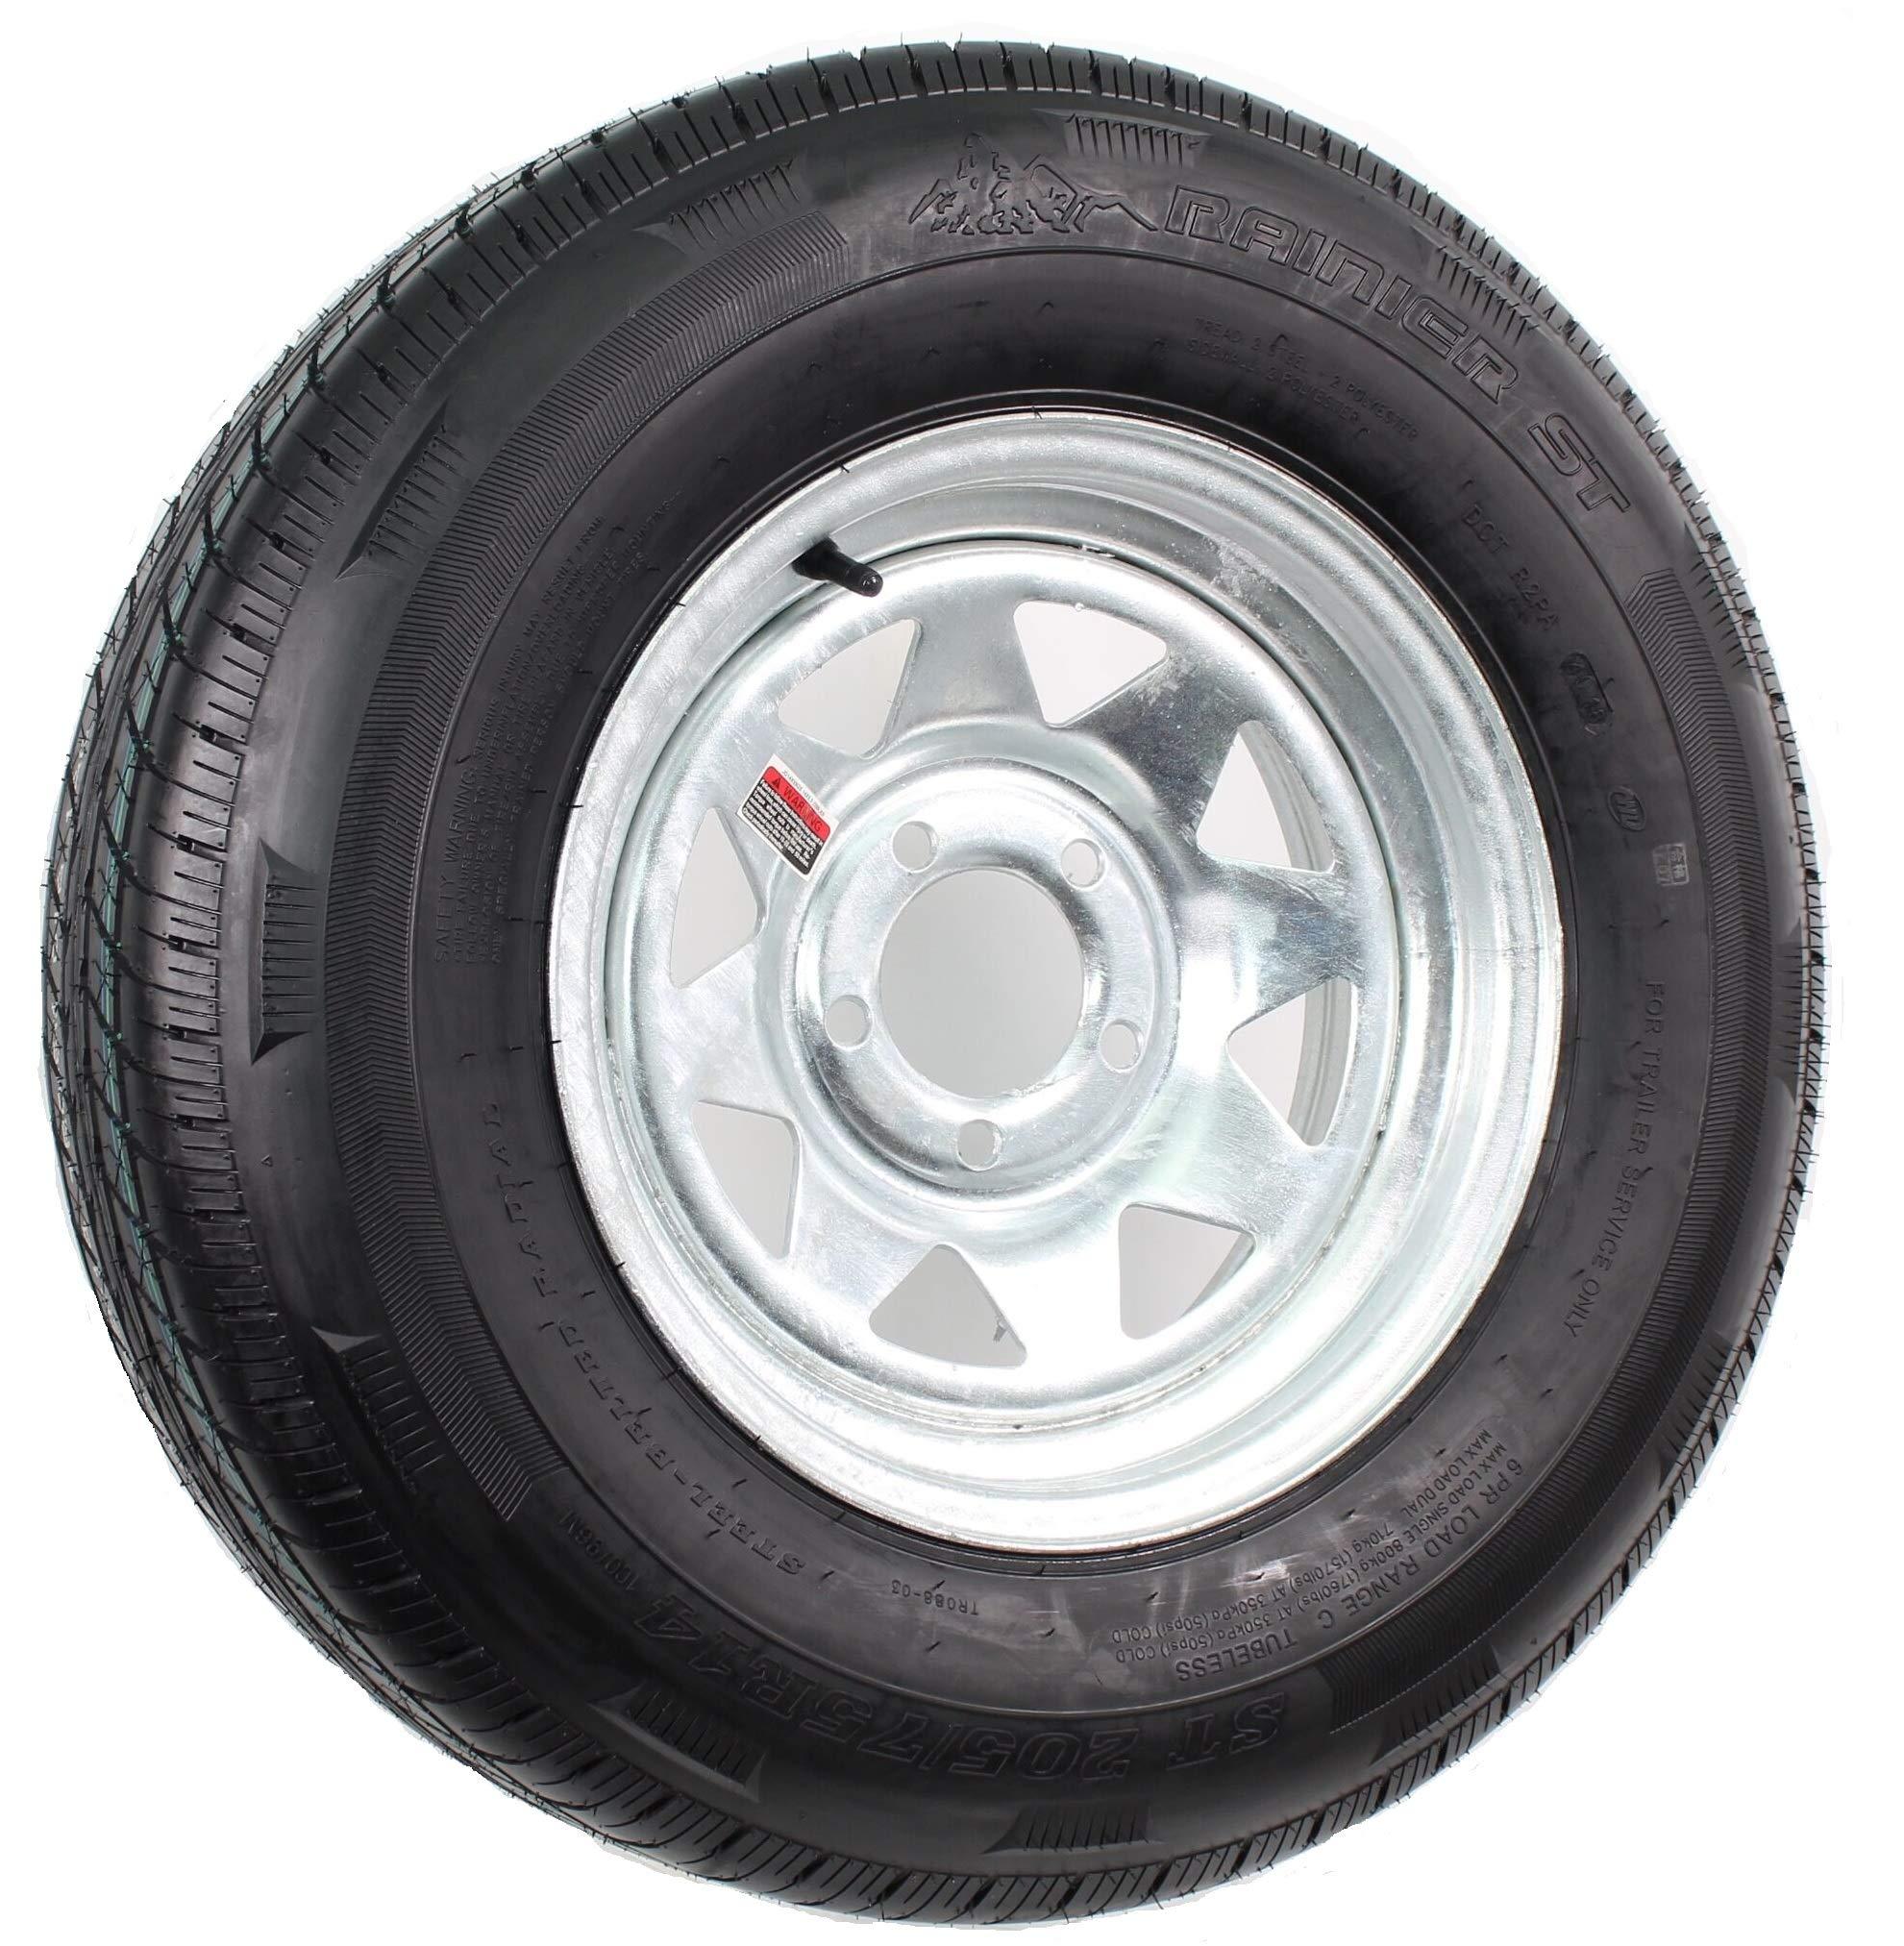 Rainier ST ST205/75R14 LRC 6 PR Radial Trailer Tire on 14'' 5 Lug Galvanized Spoke Trailer Wheel by Rainier ST